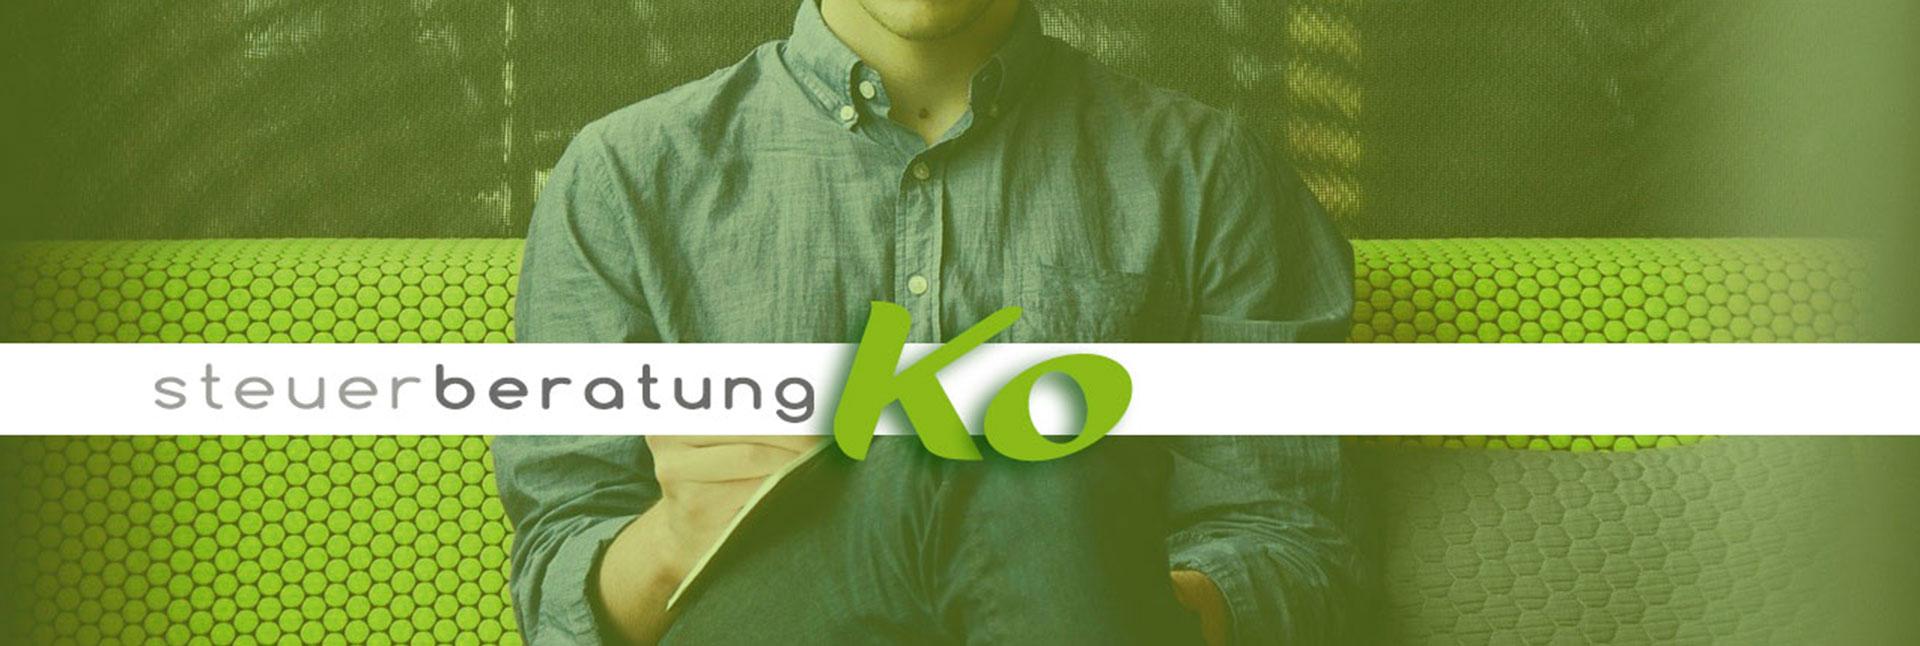 Steuerberatung Ko